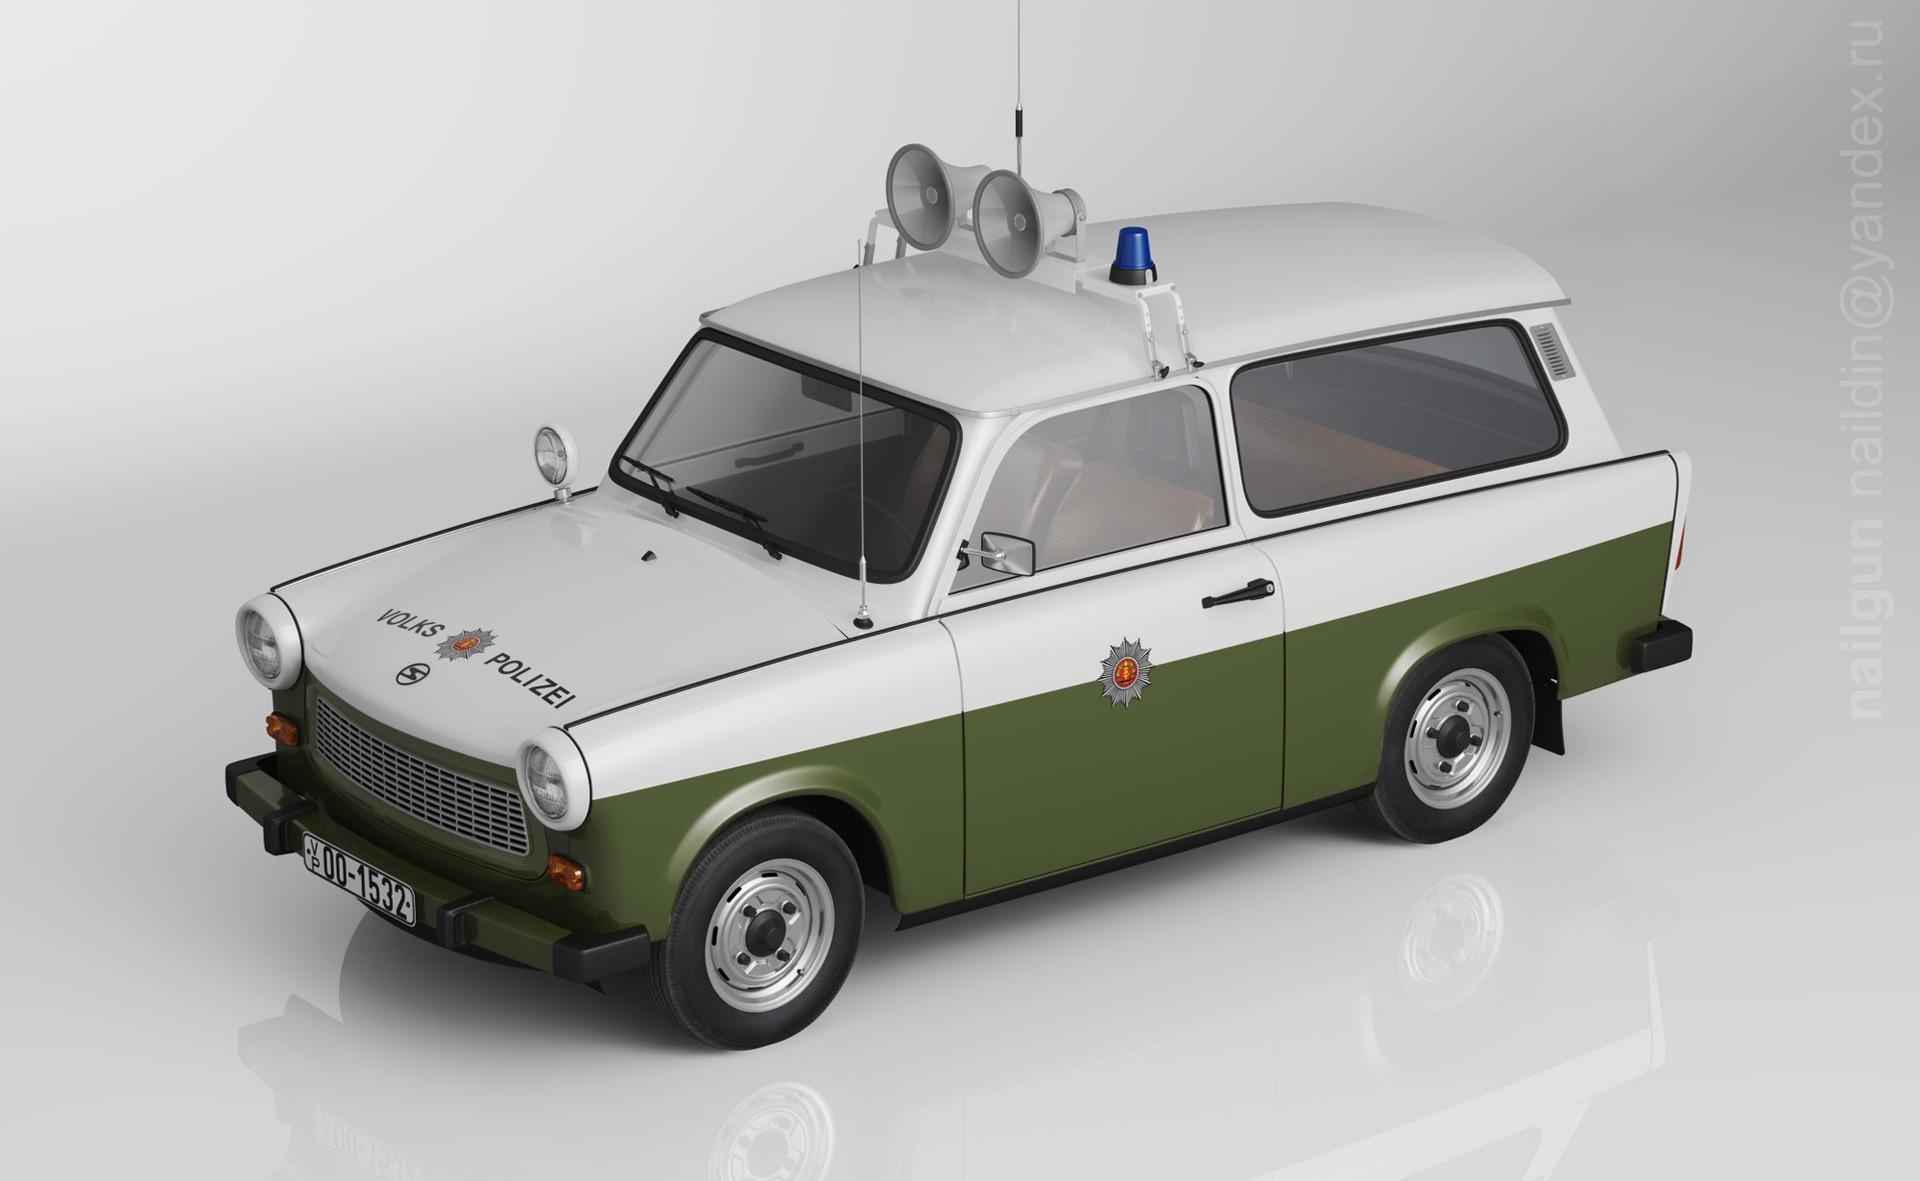 Nail khusnutdinov pwc 023 000 trabant combi miniature